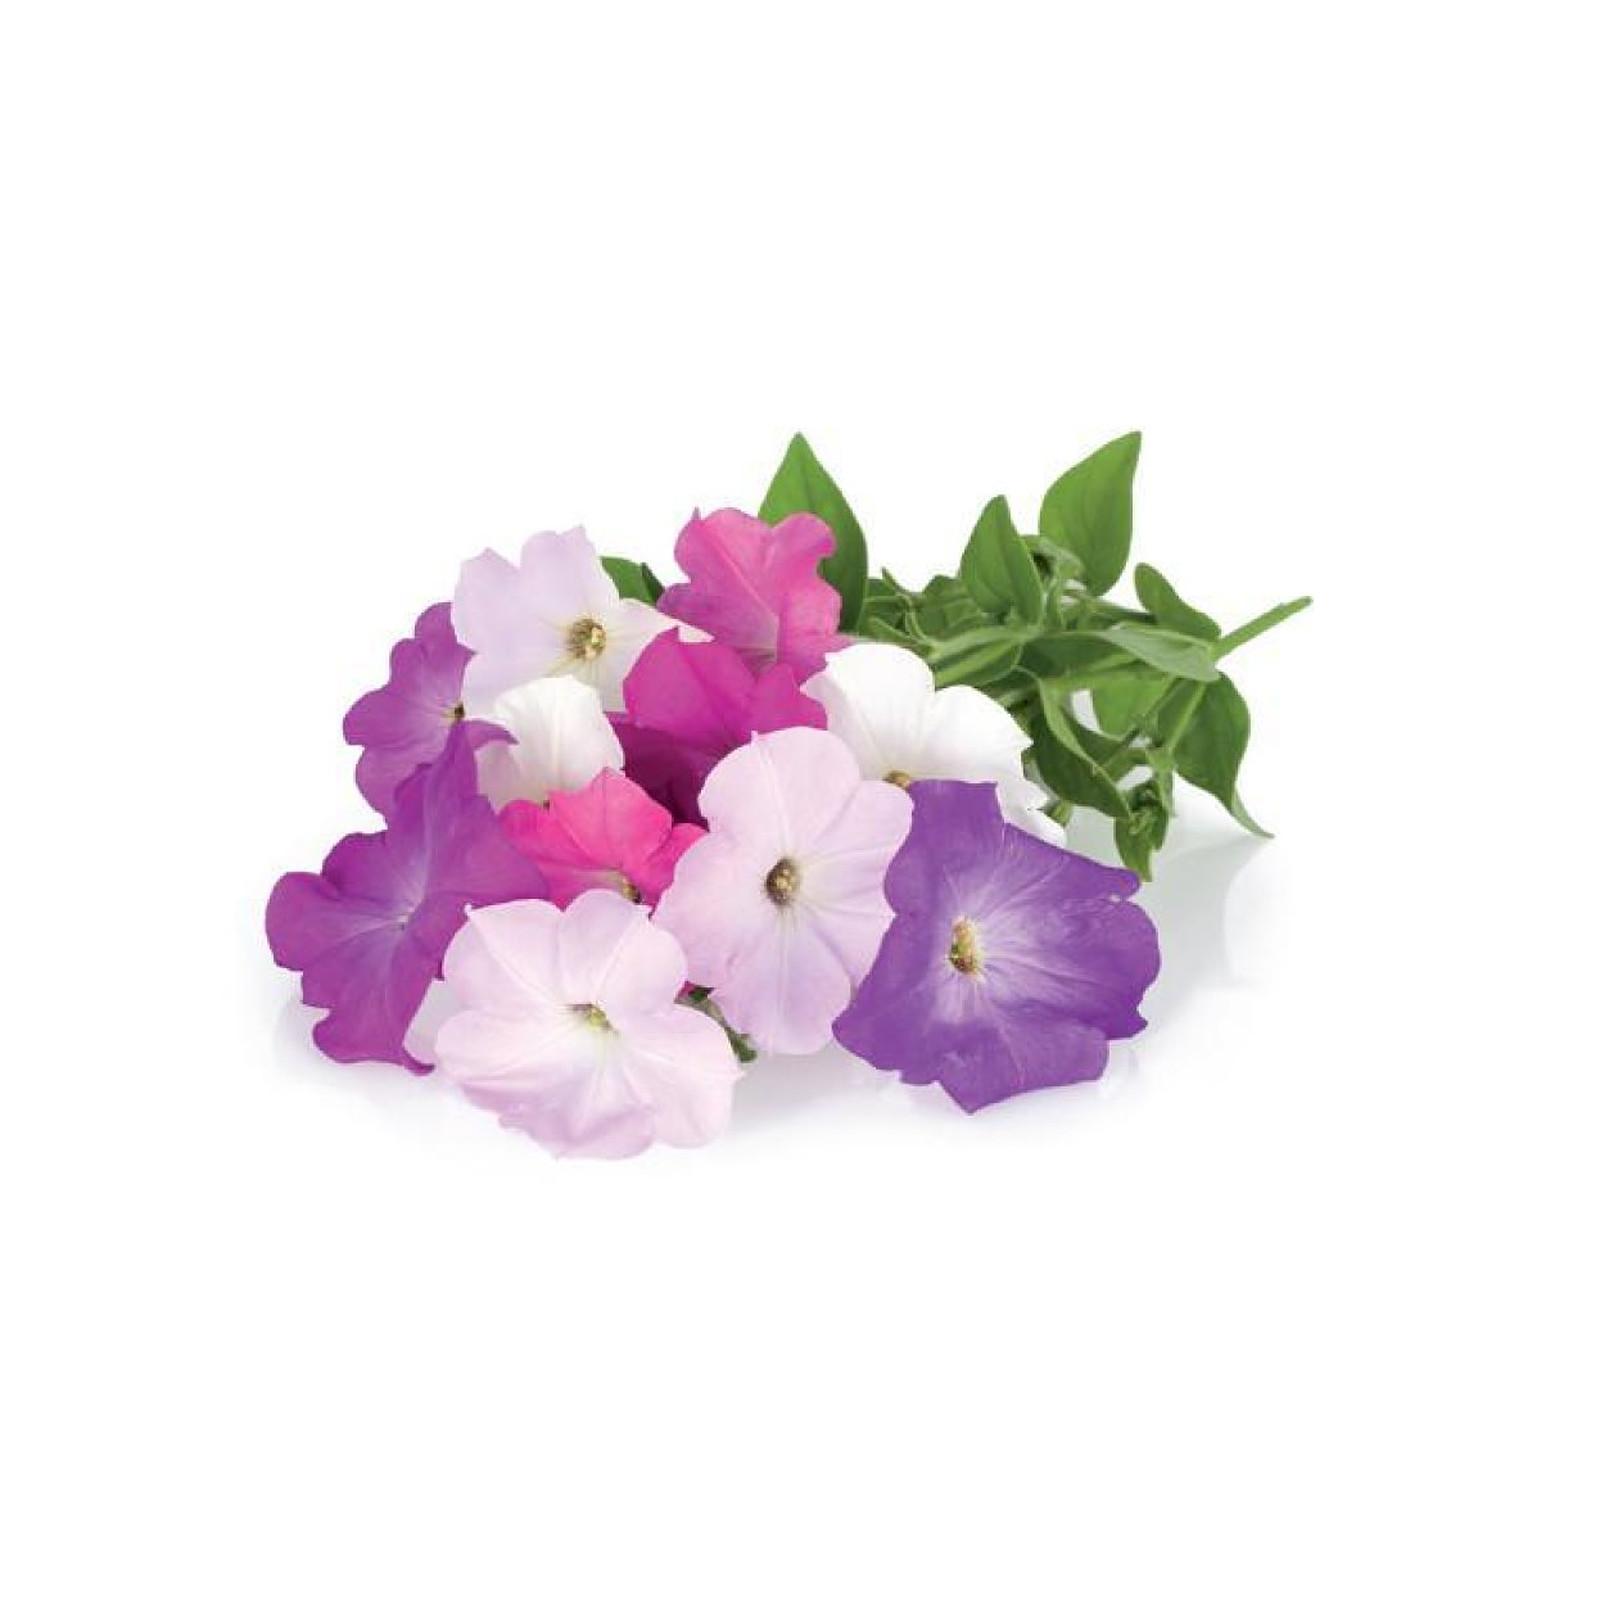 Click and Grow Recharge Triple De Pétunias Pour Smart Garden CLG_SG3_PETUNIA